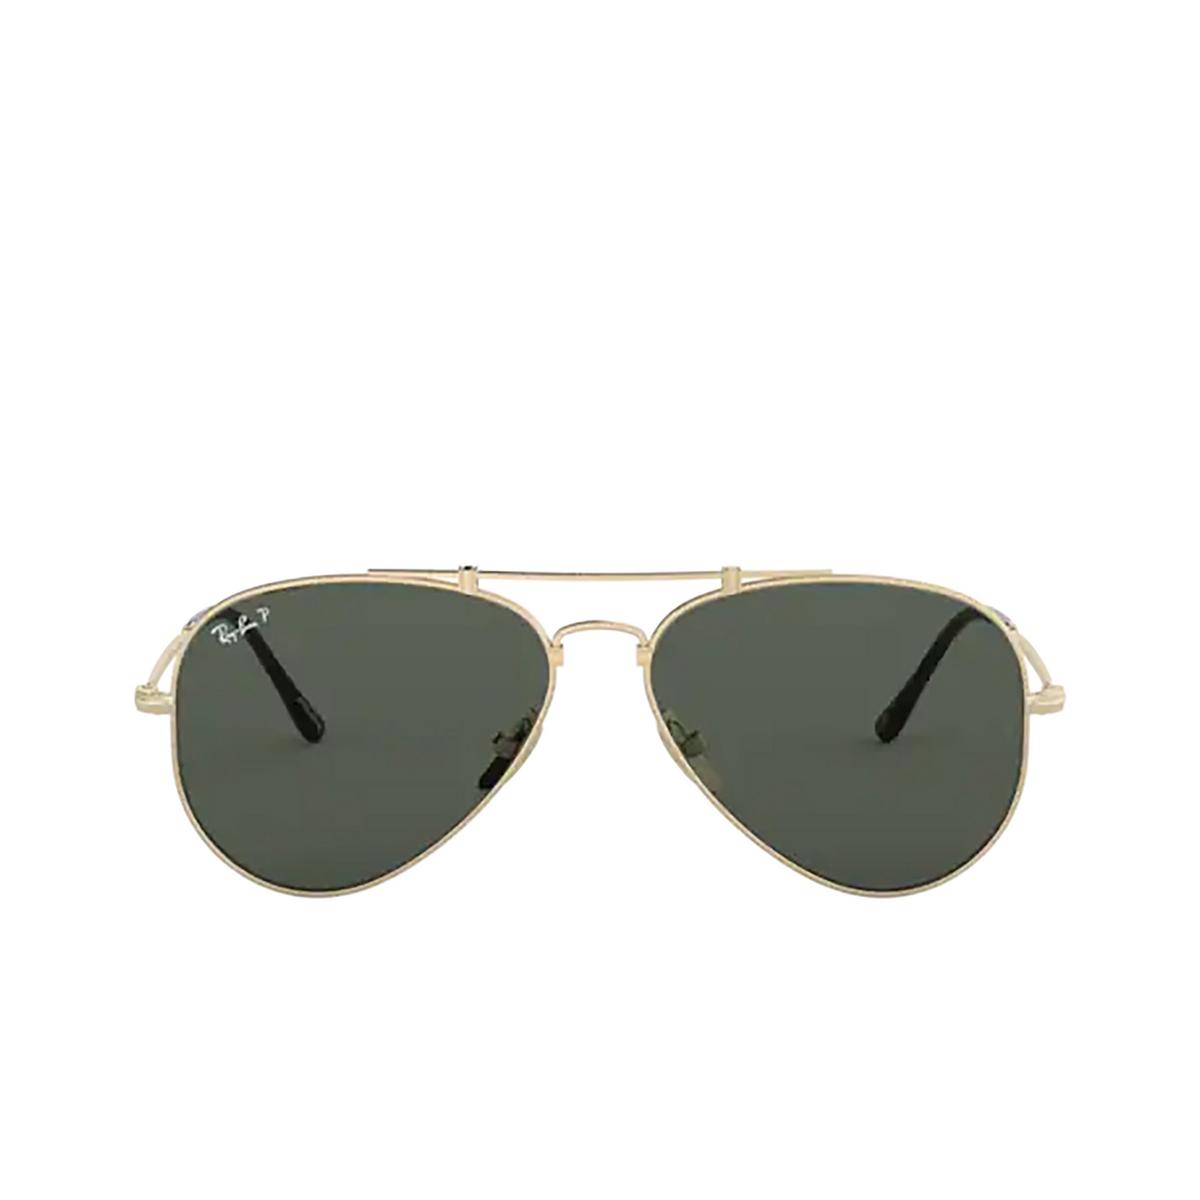 Ray-Ban® Aviator Sunglasses: Titanium RB8125M color Demi Gloss White Gold 9143 - 1/3.